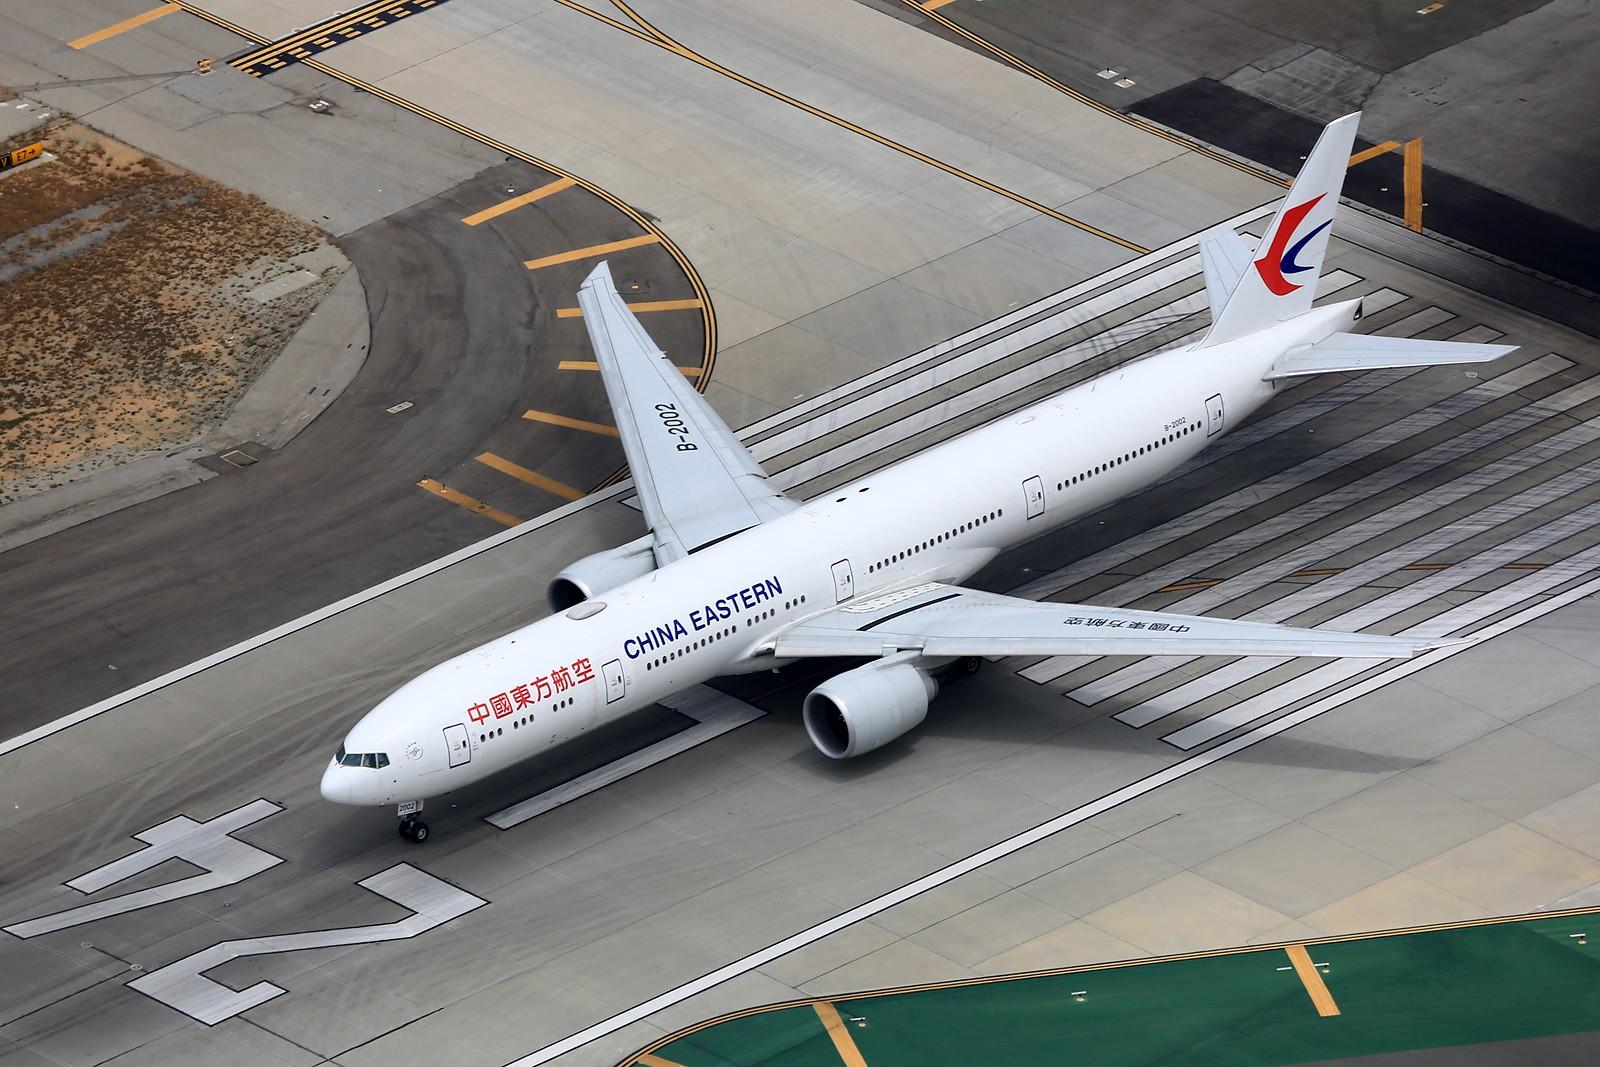 Re:[原创]【LAX】**********777级了,空对空&空对地部分777合集[1600*1067]********** BOEING 777-300ER B-2002 美国洛杉矶机场